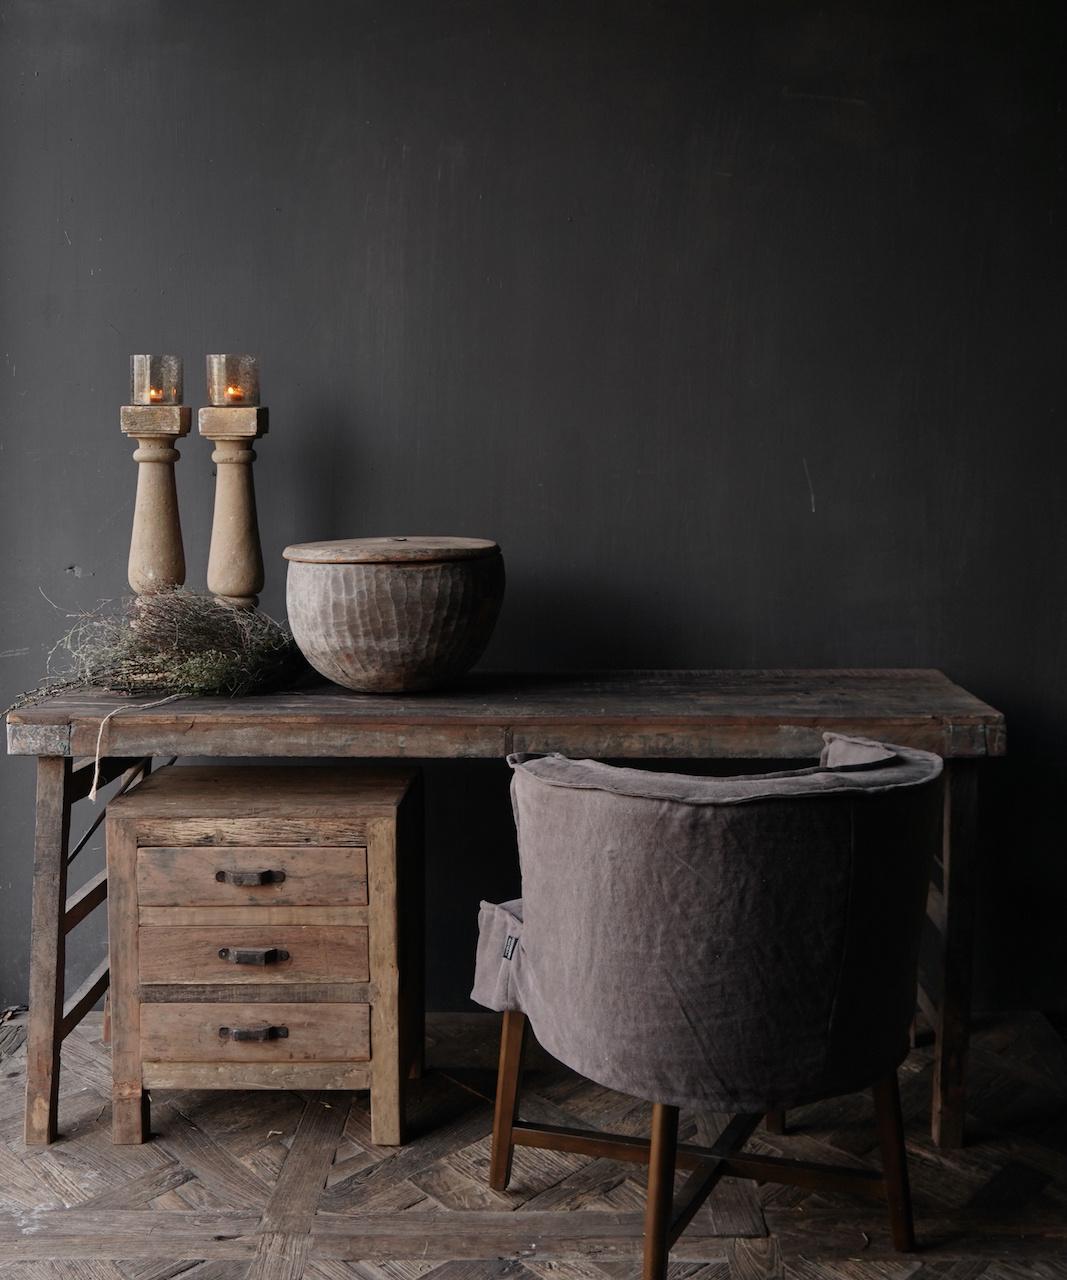 Oude Authentieke markt tafel-1